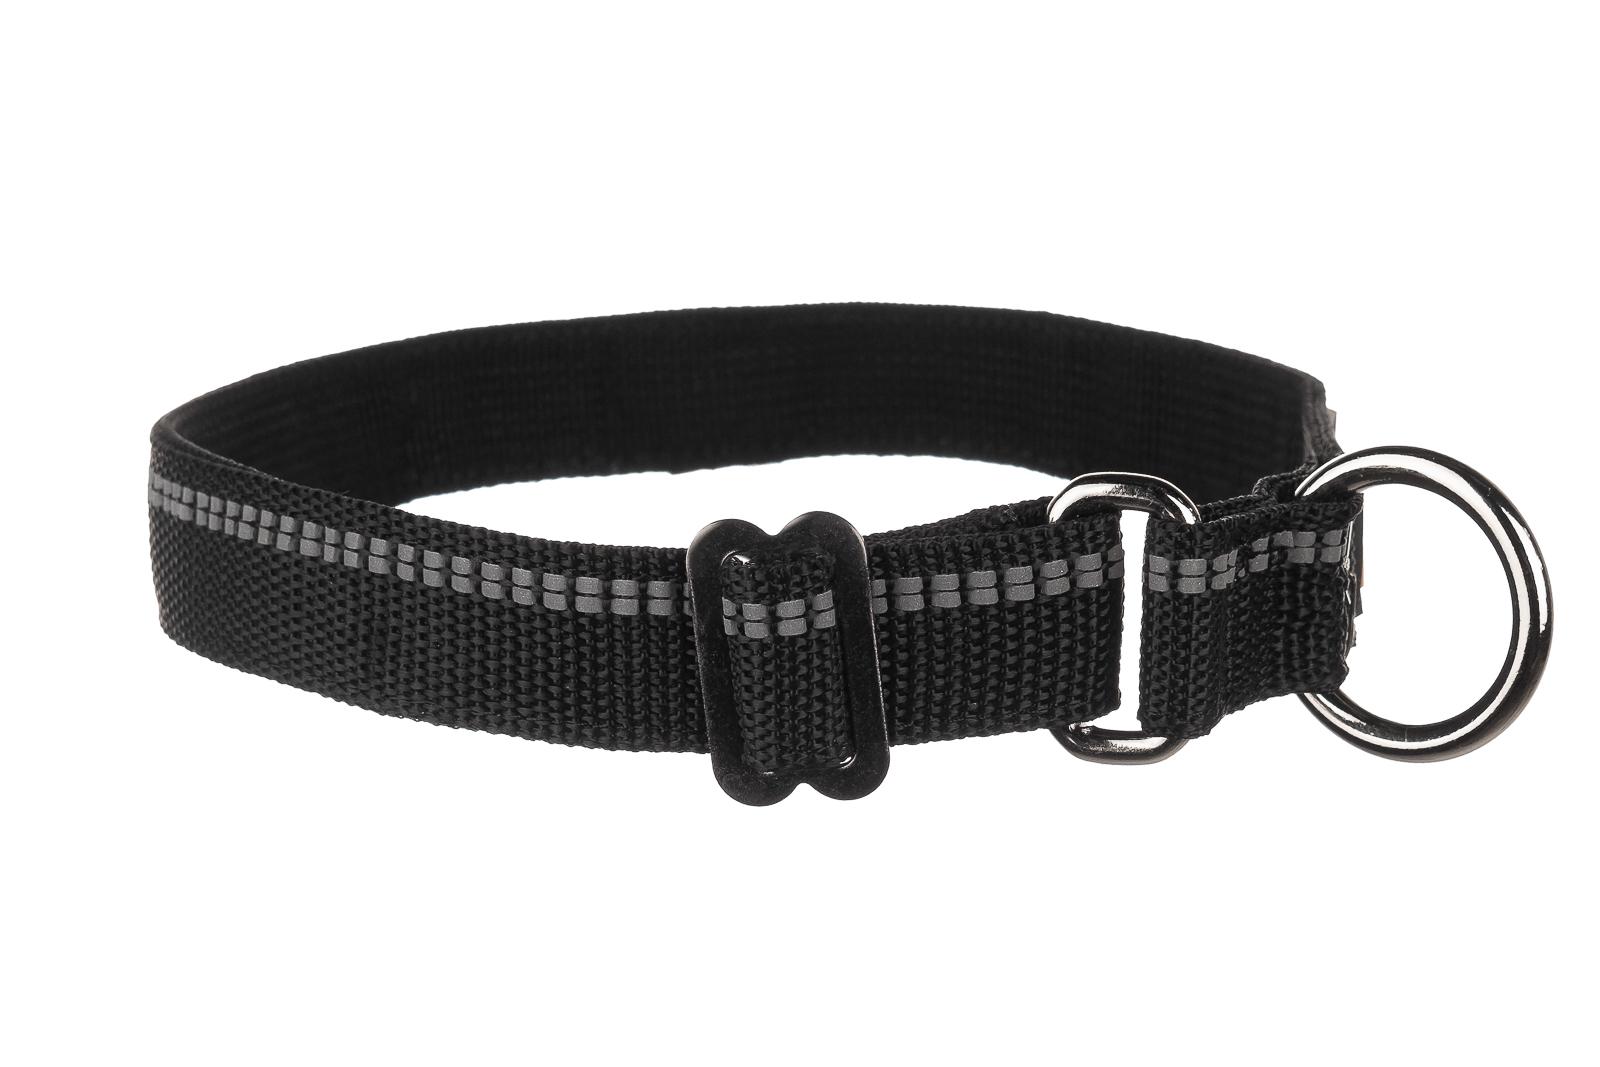 Polypro Collar